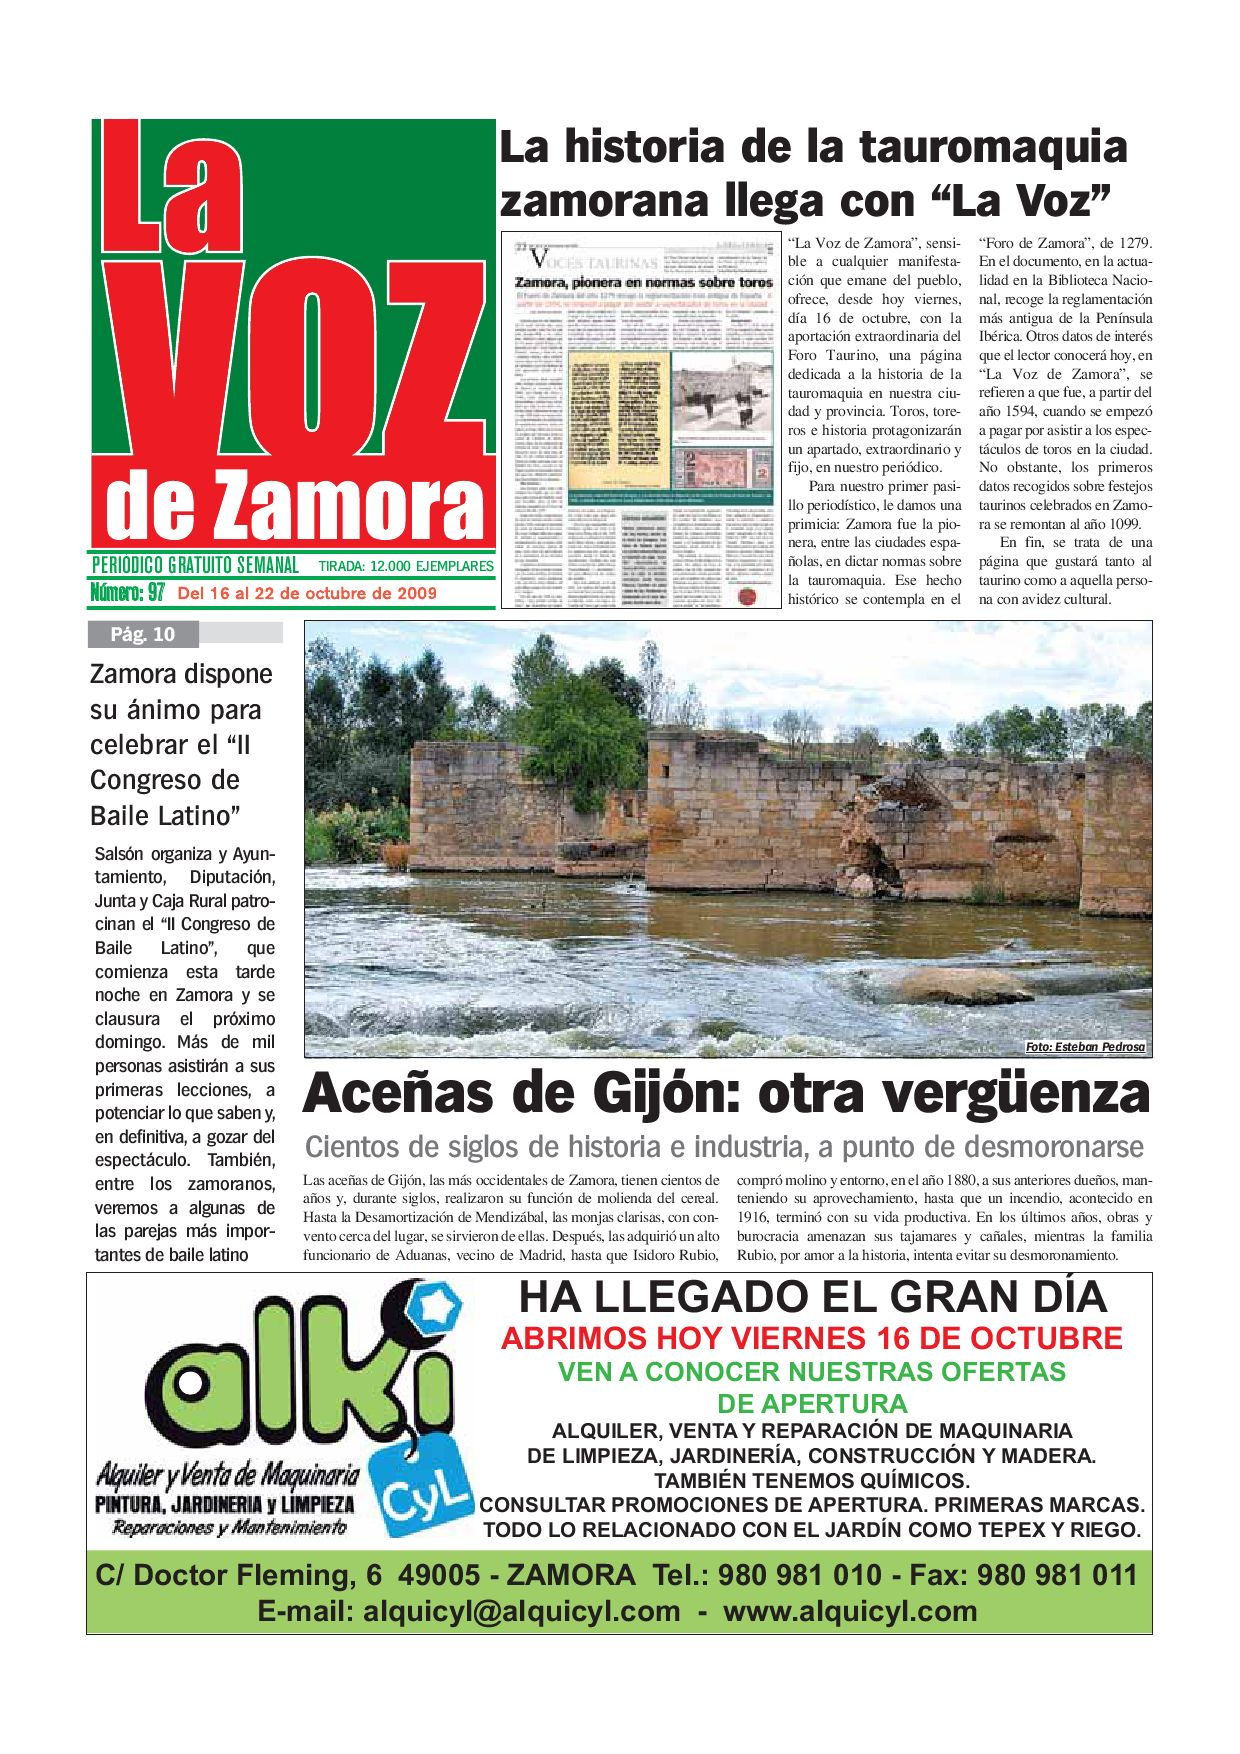 LA VOZ DE ZAMORA 0097 by La Voz de Zamora - issuu